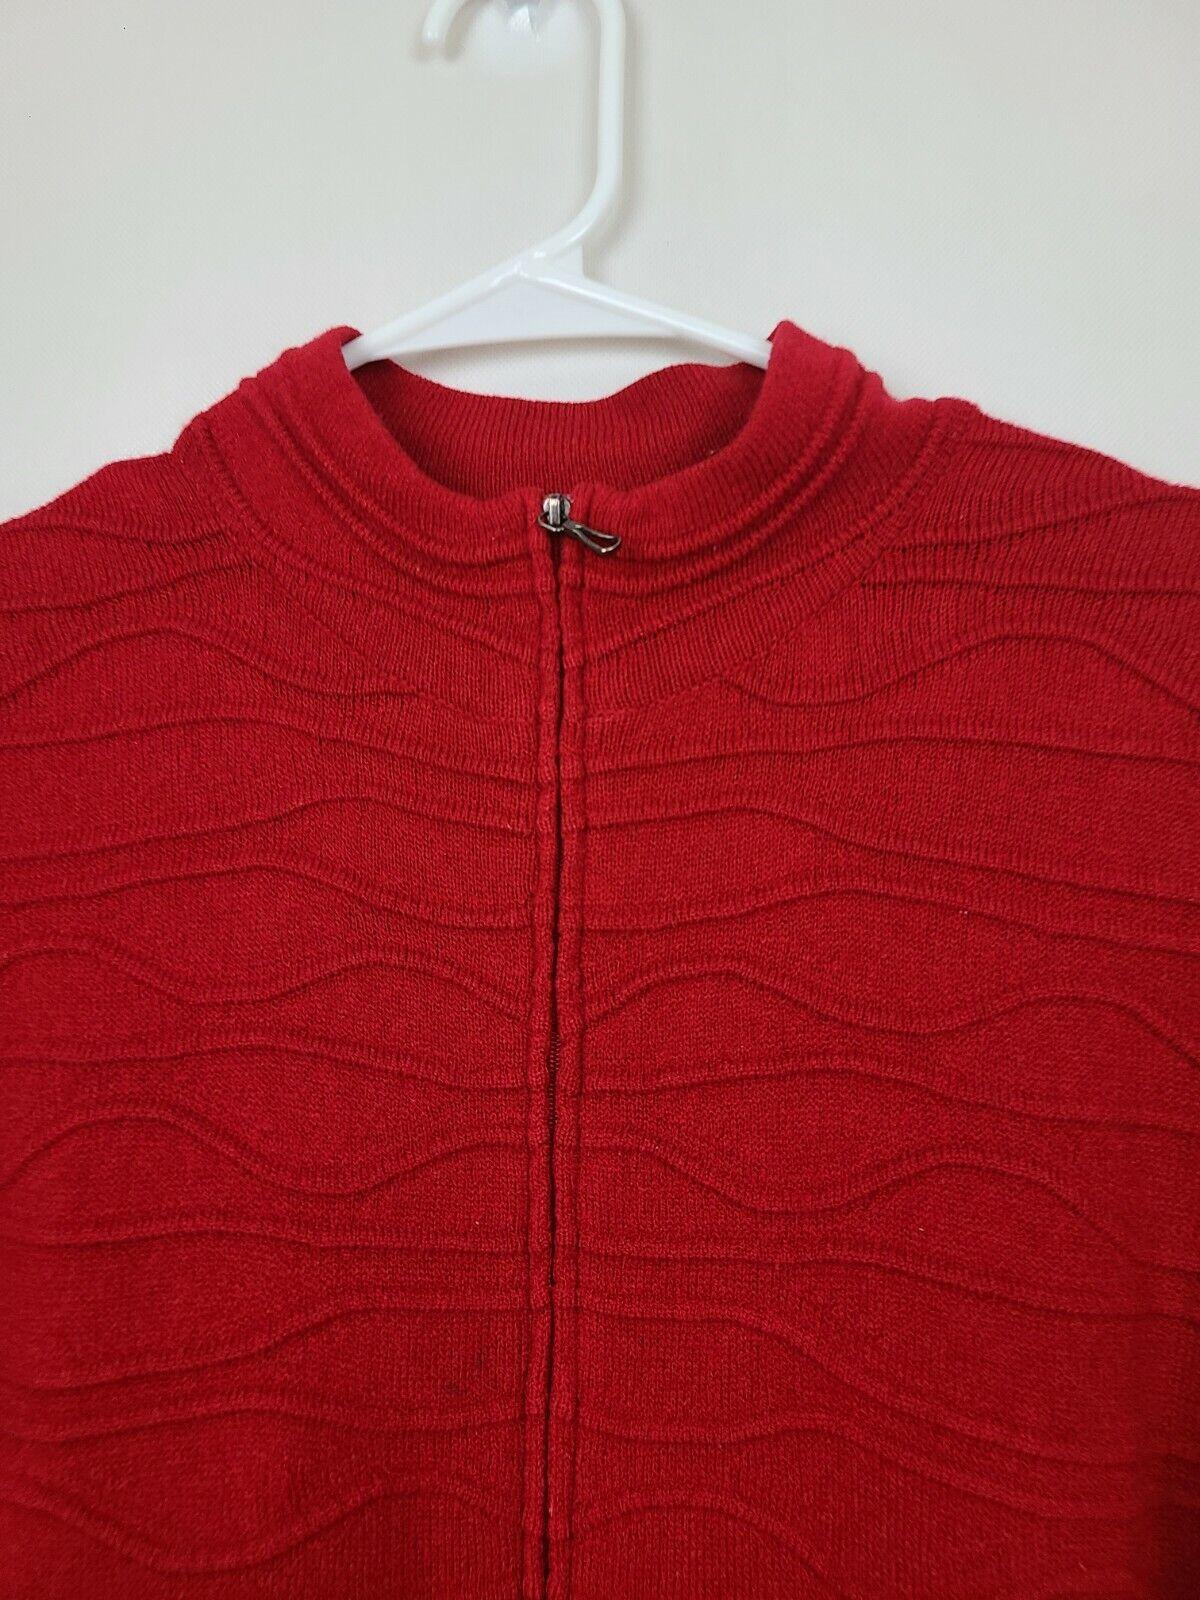 Coldwater Creek Womens Cardigan Sweater Medium Re… - image 2